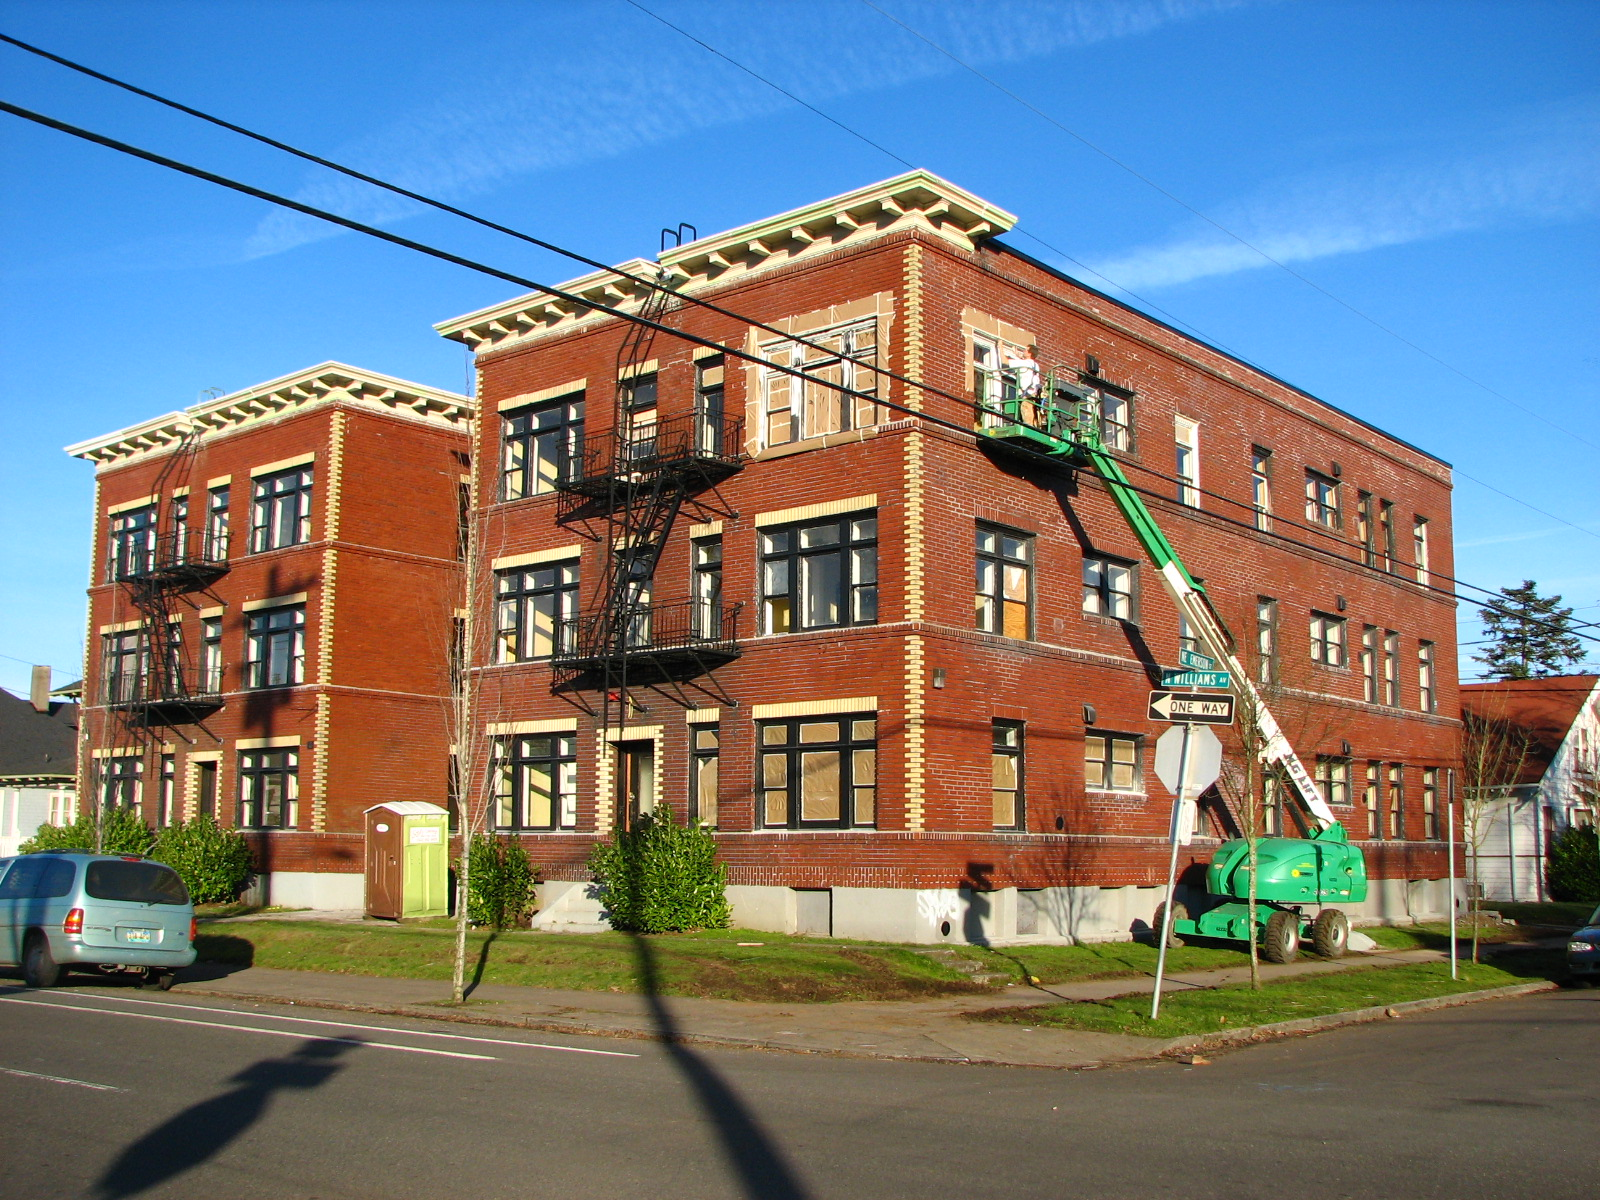 Emerson_Apartments_-_Portland_Oregon.jpg